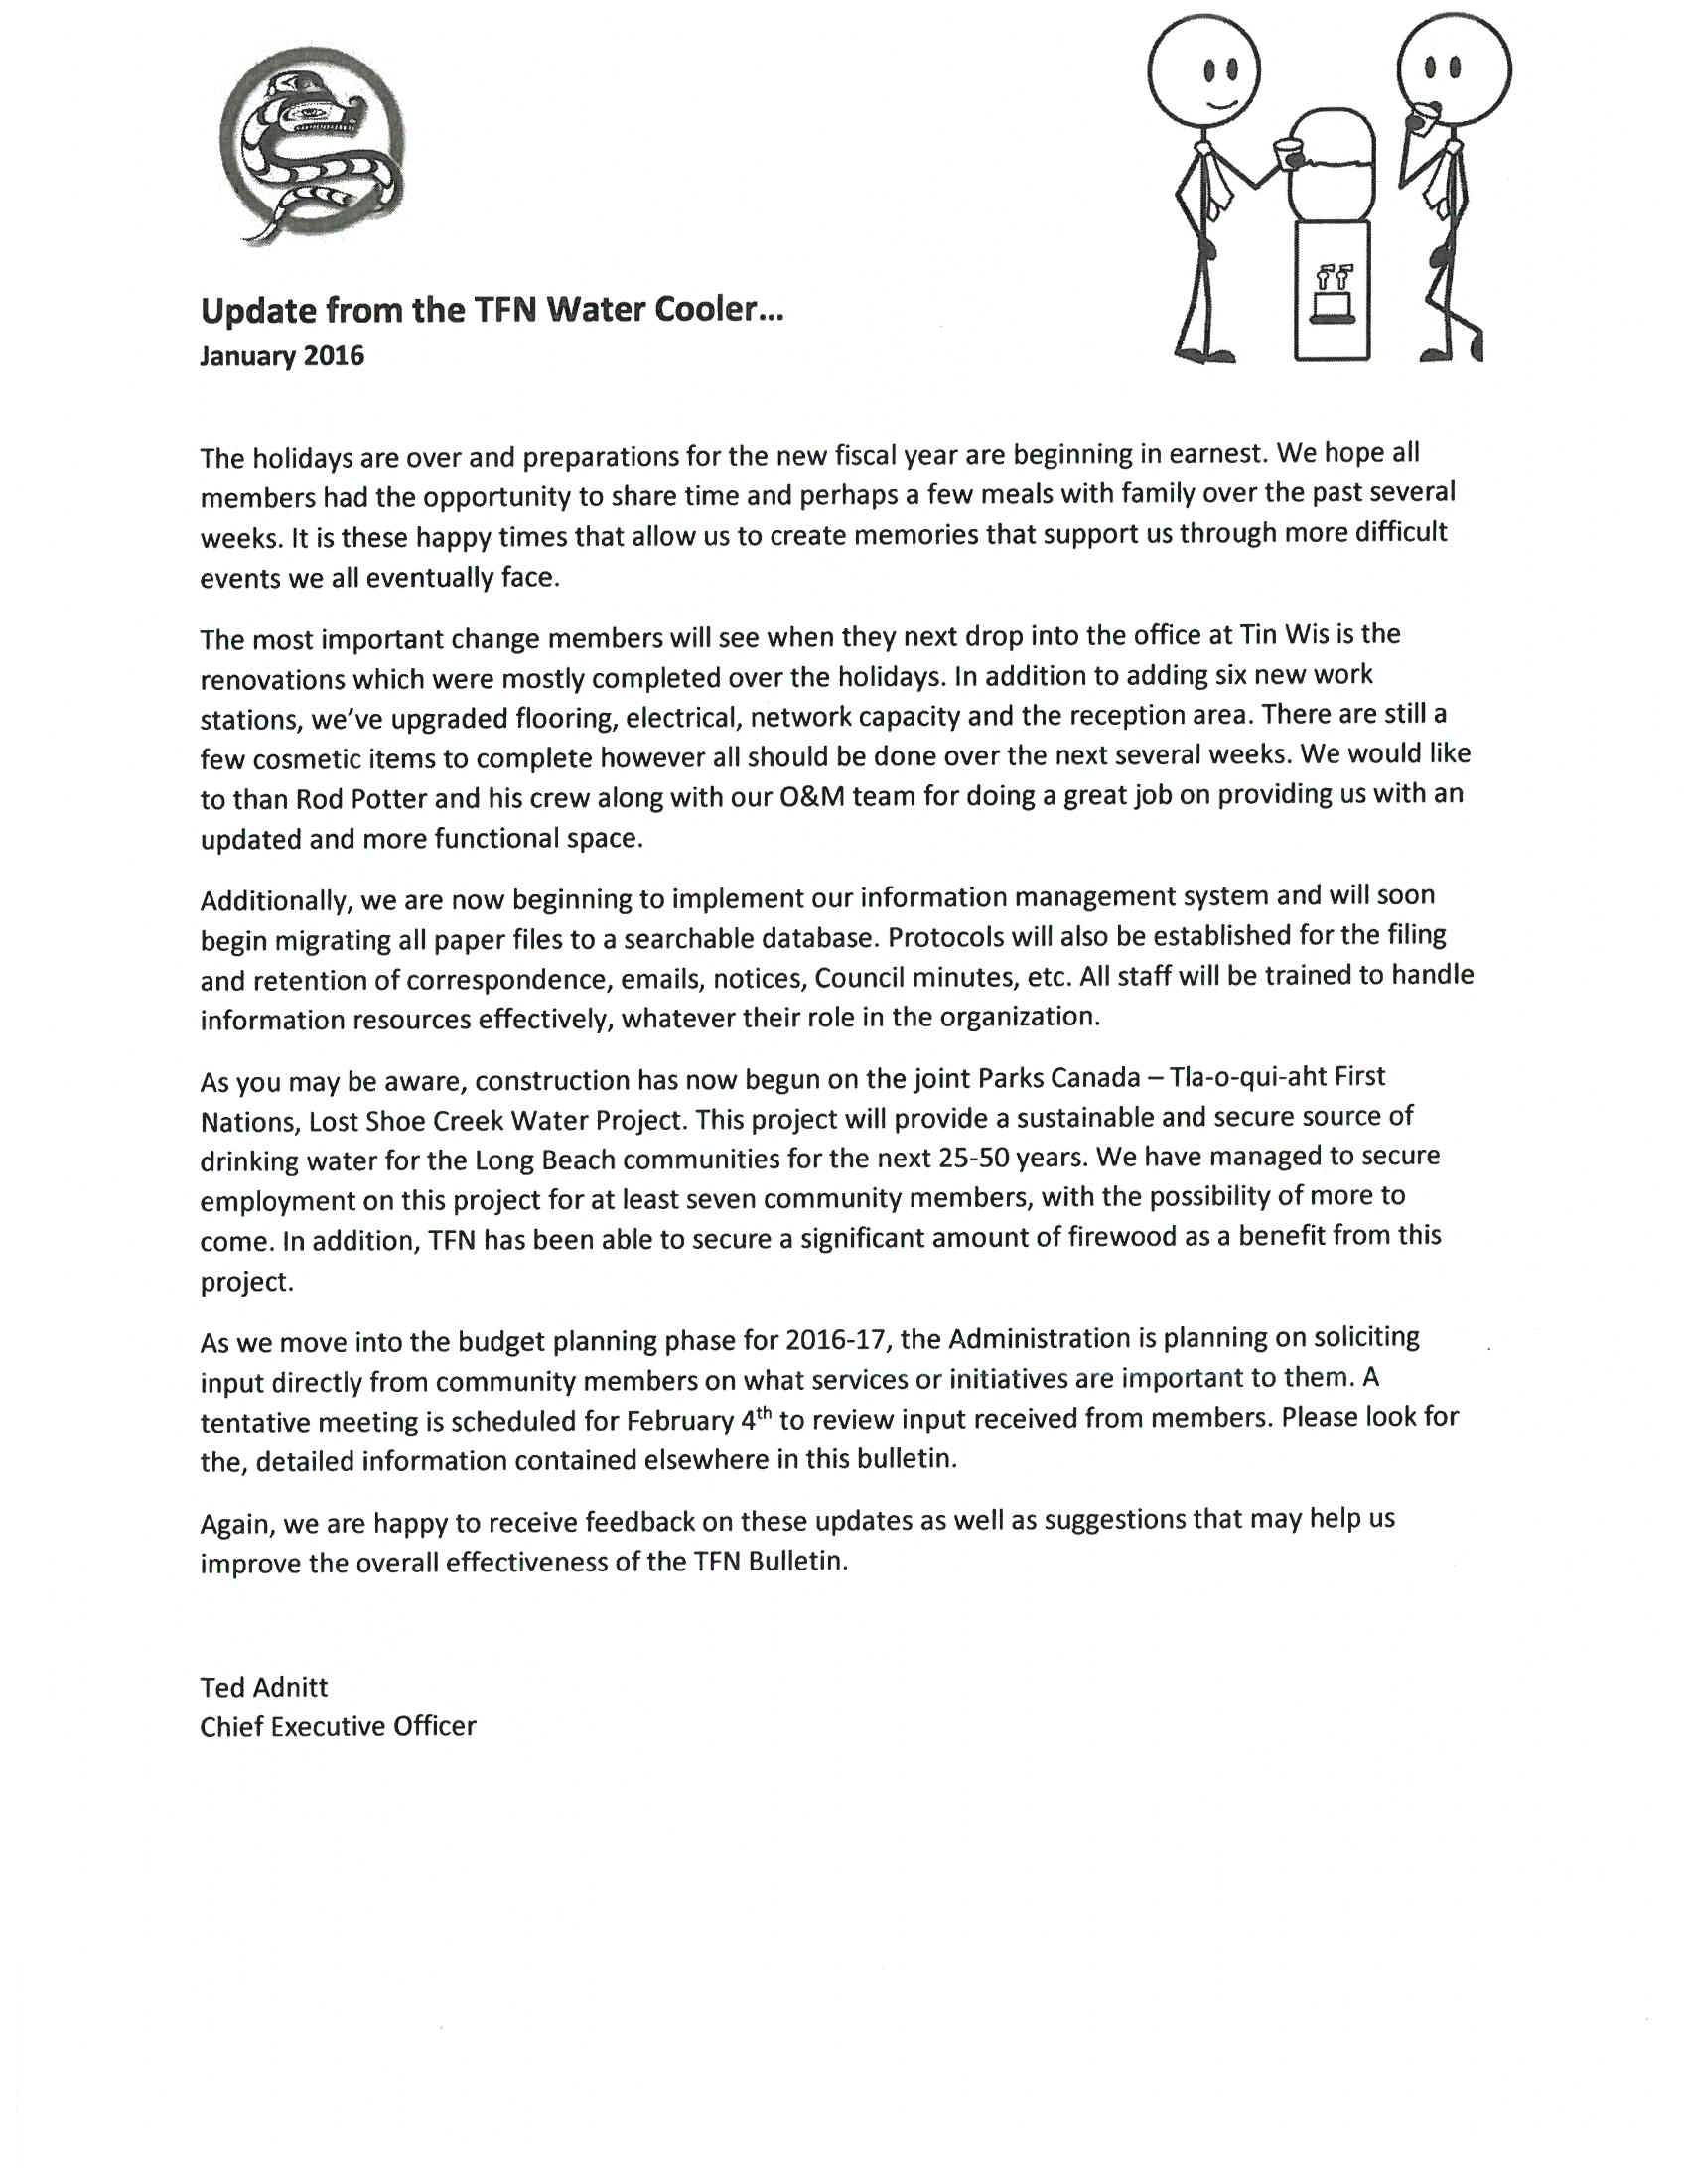 TFN Bulletin Jan 15-2016_Page_06.jpg